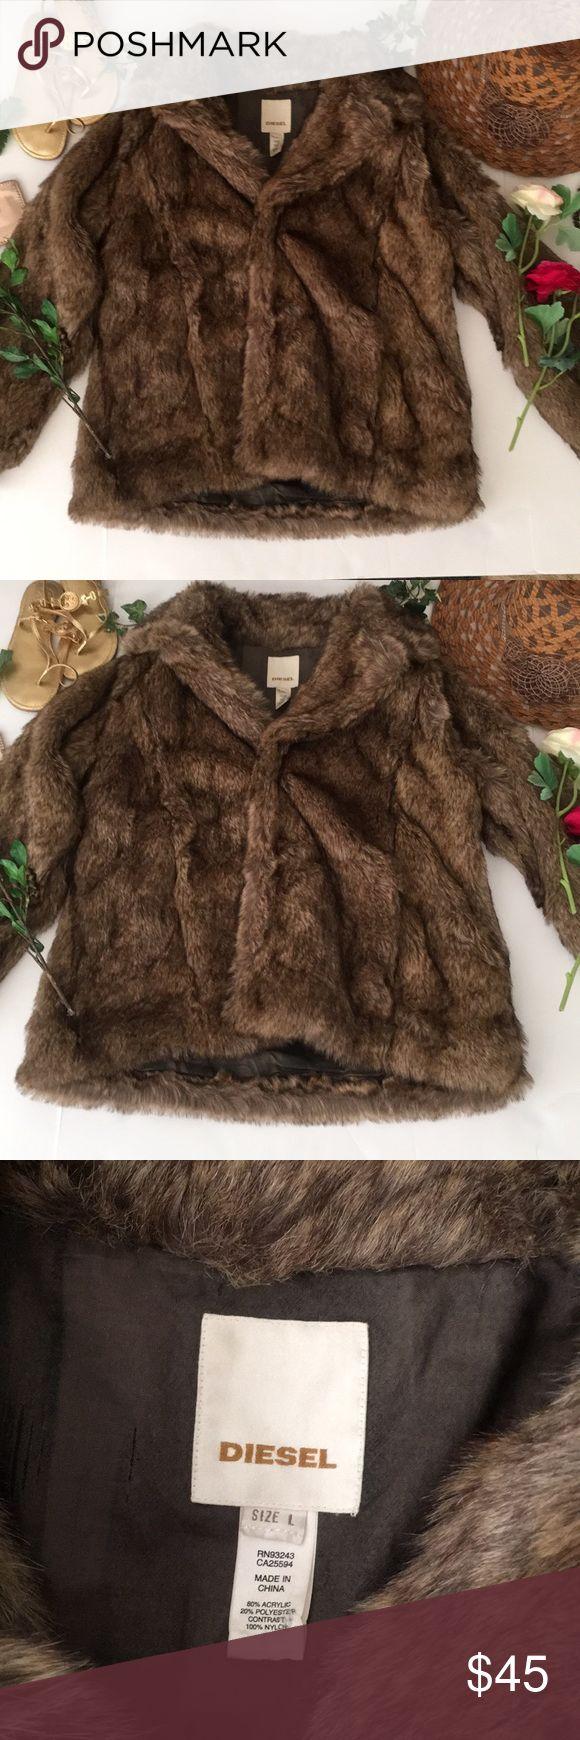 ❤Diesel Coat❤ ❤In great gently used condition Diesel Coat in size Large❤ Diesel Jackets & Coats